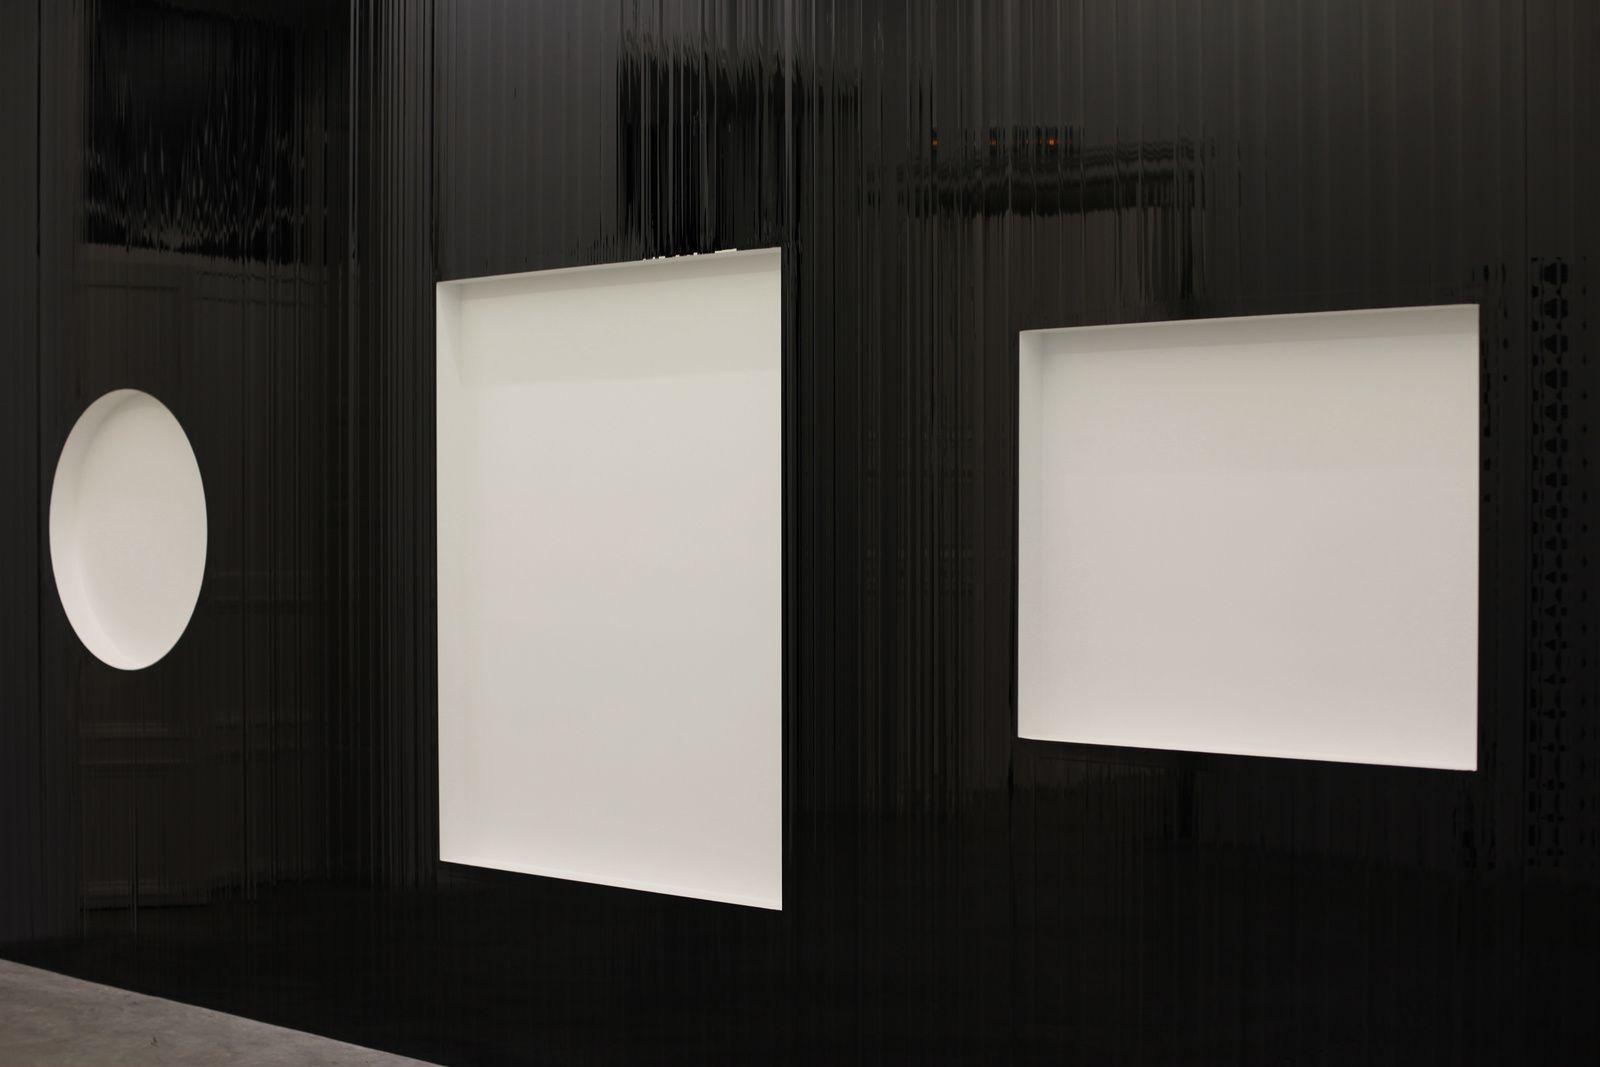 """Orphische Schatten"", 2013 de Gregor HILDEBRANDT - Courtesy Almine Rech Gallery © Photo Éric Simon"